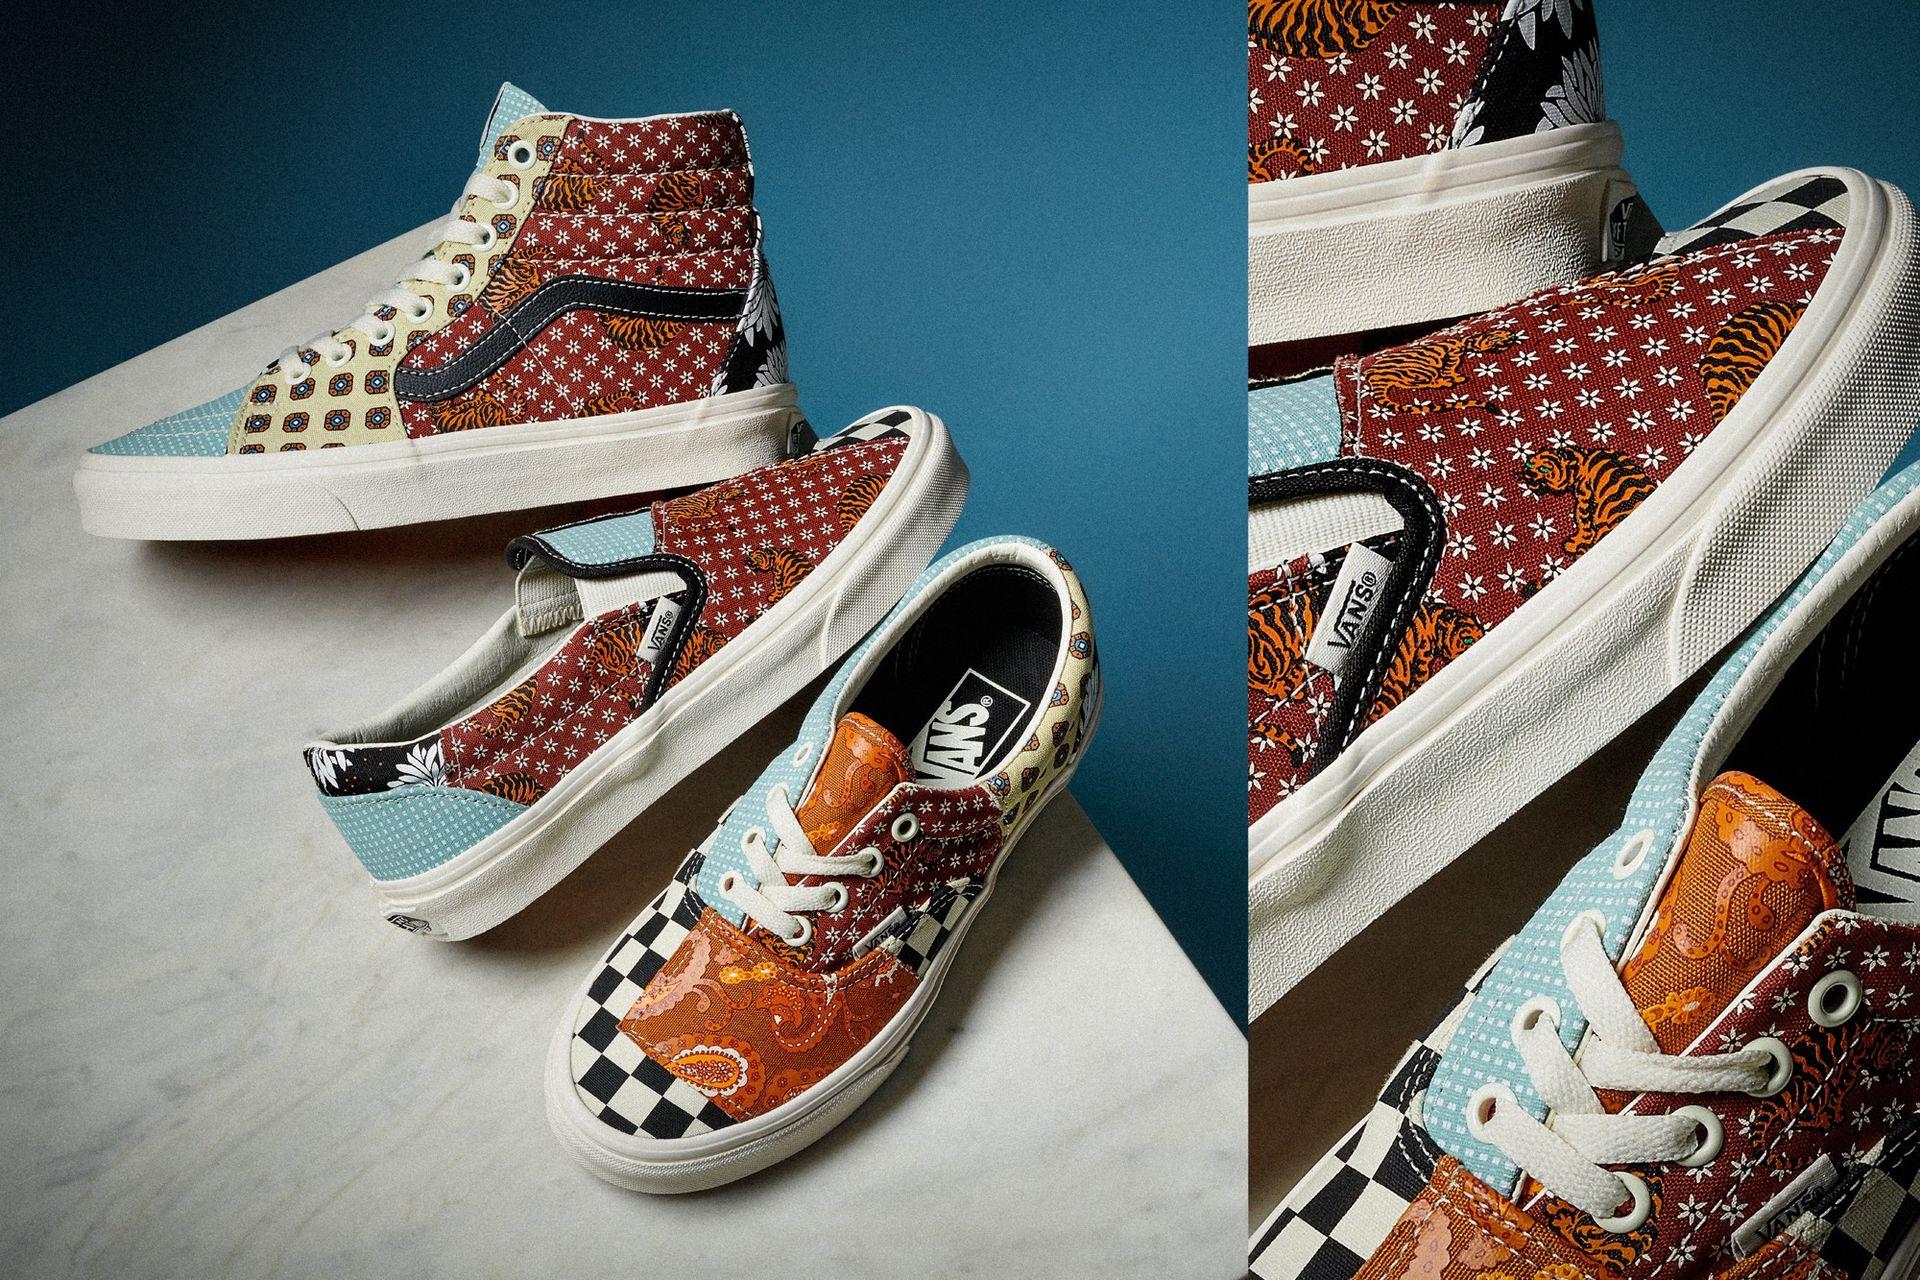 Tre klassiska Vans-skor med lappverk